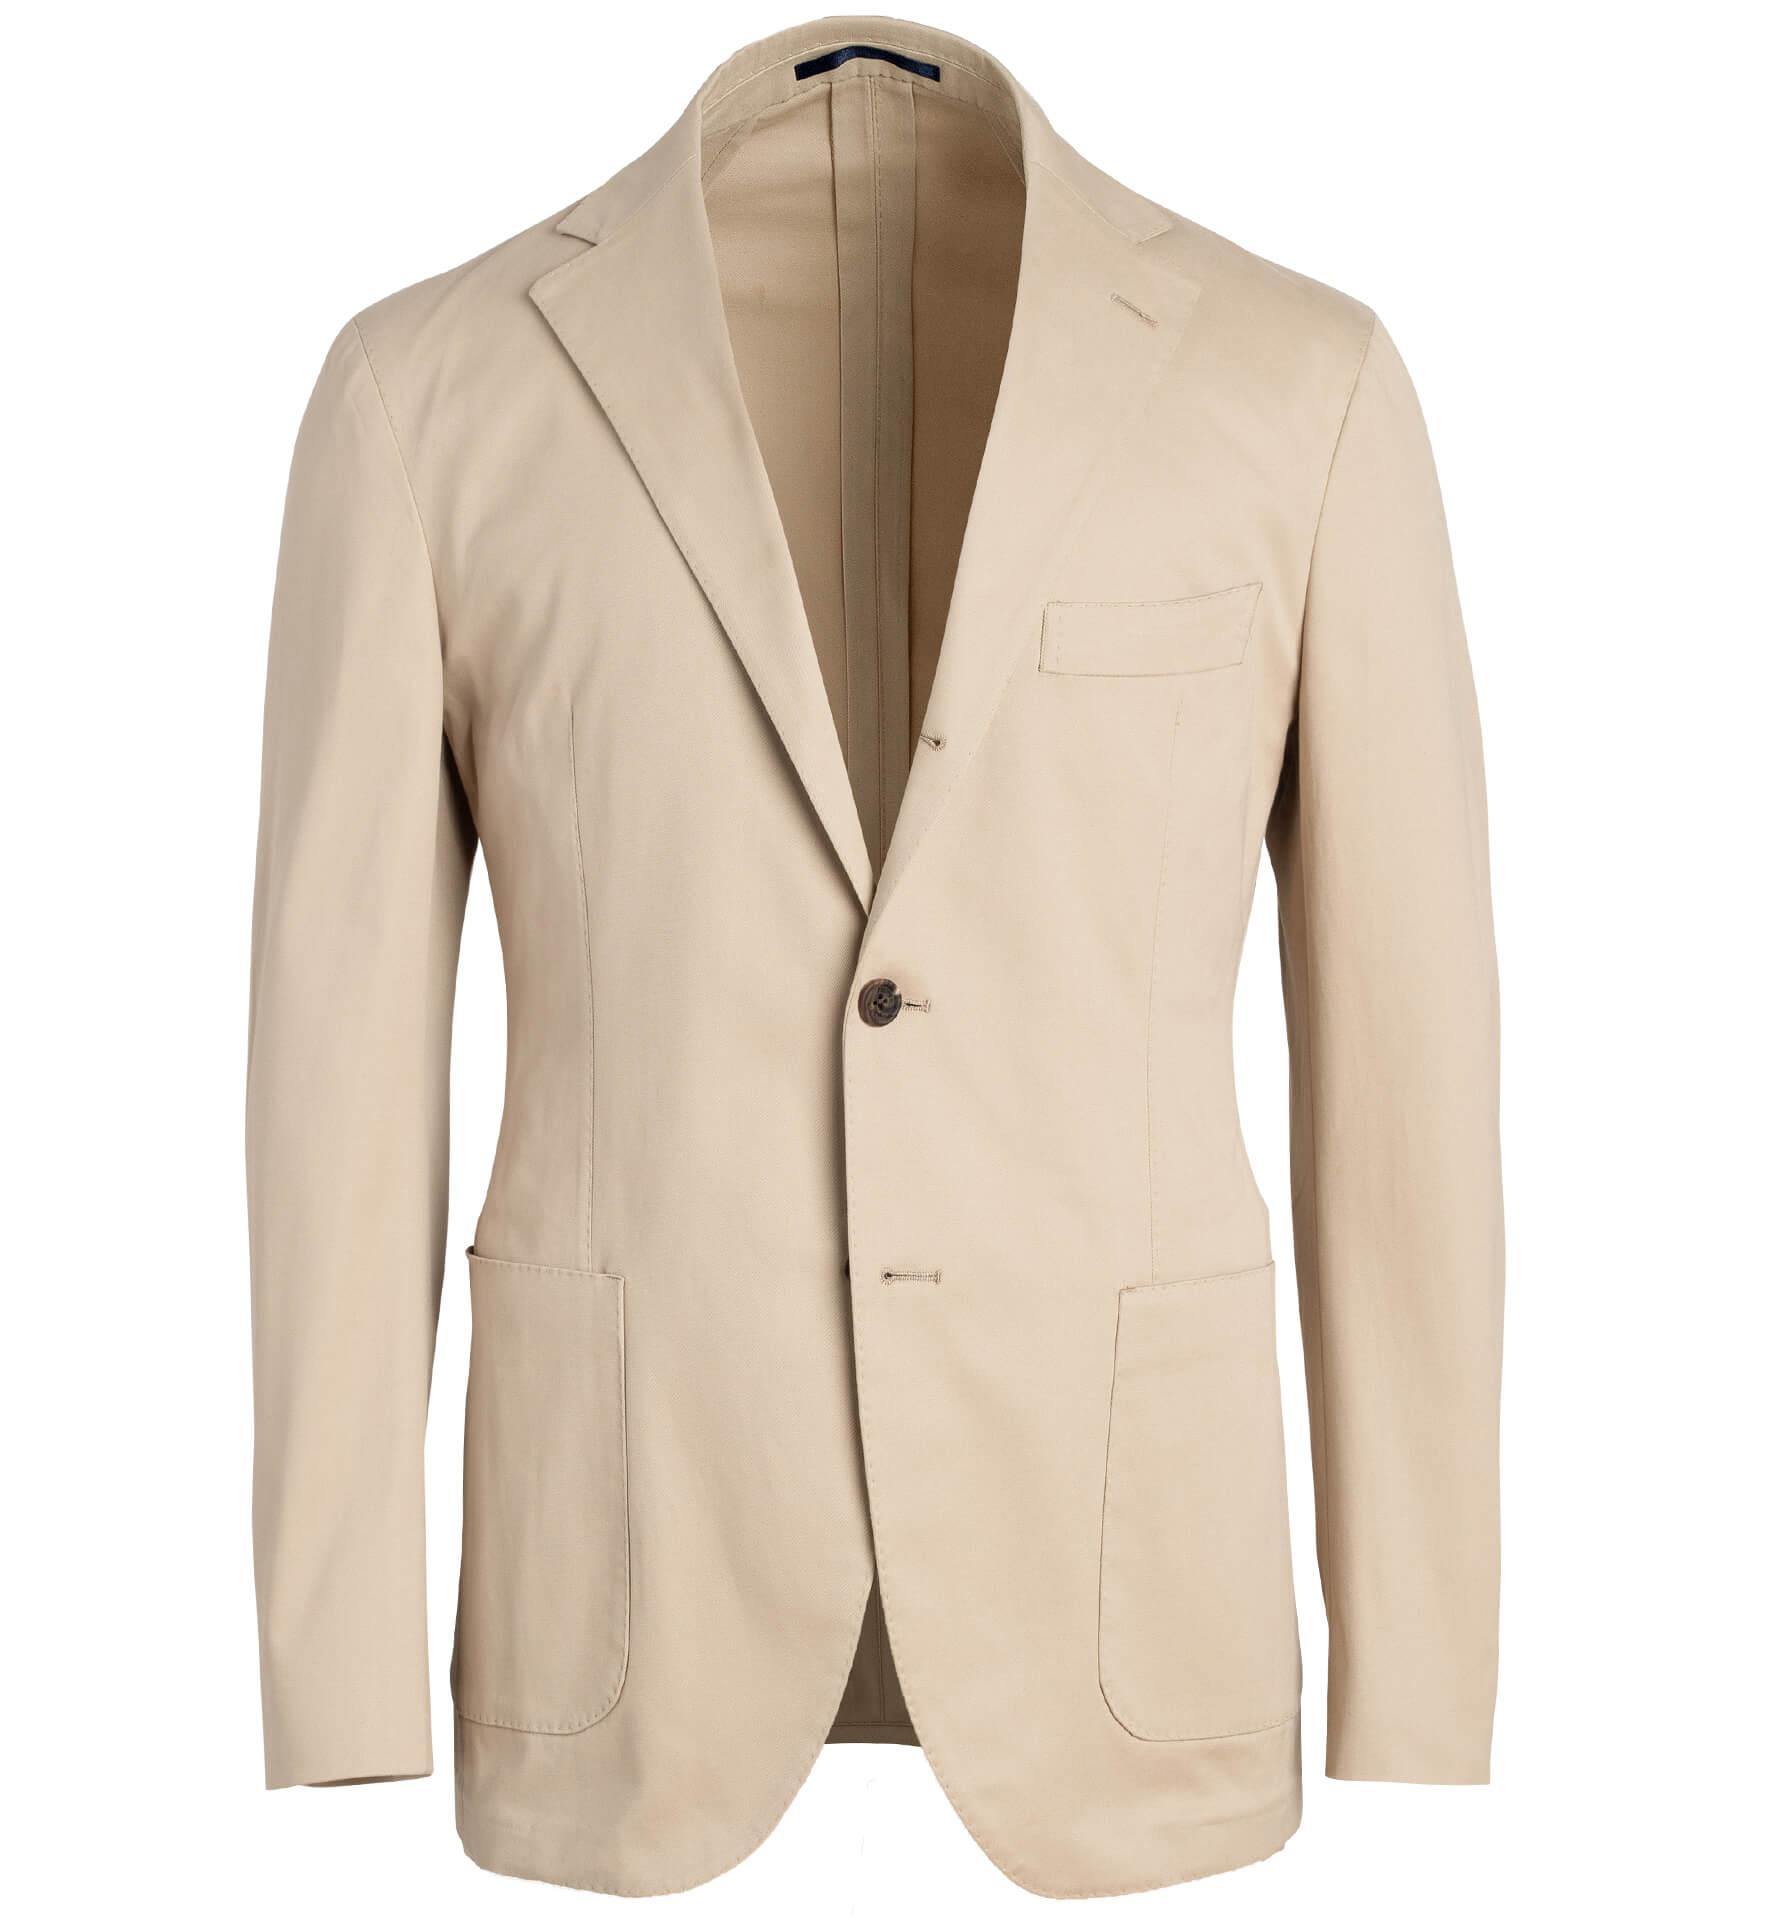 Zoom Image of Waverly Beige Stretch Cotton Jacket